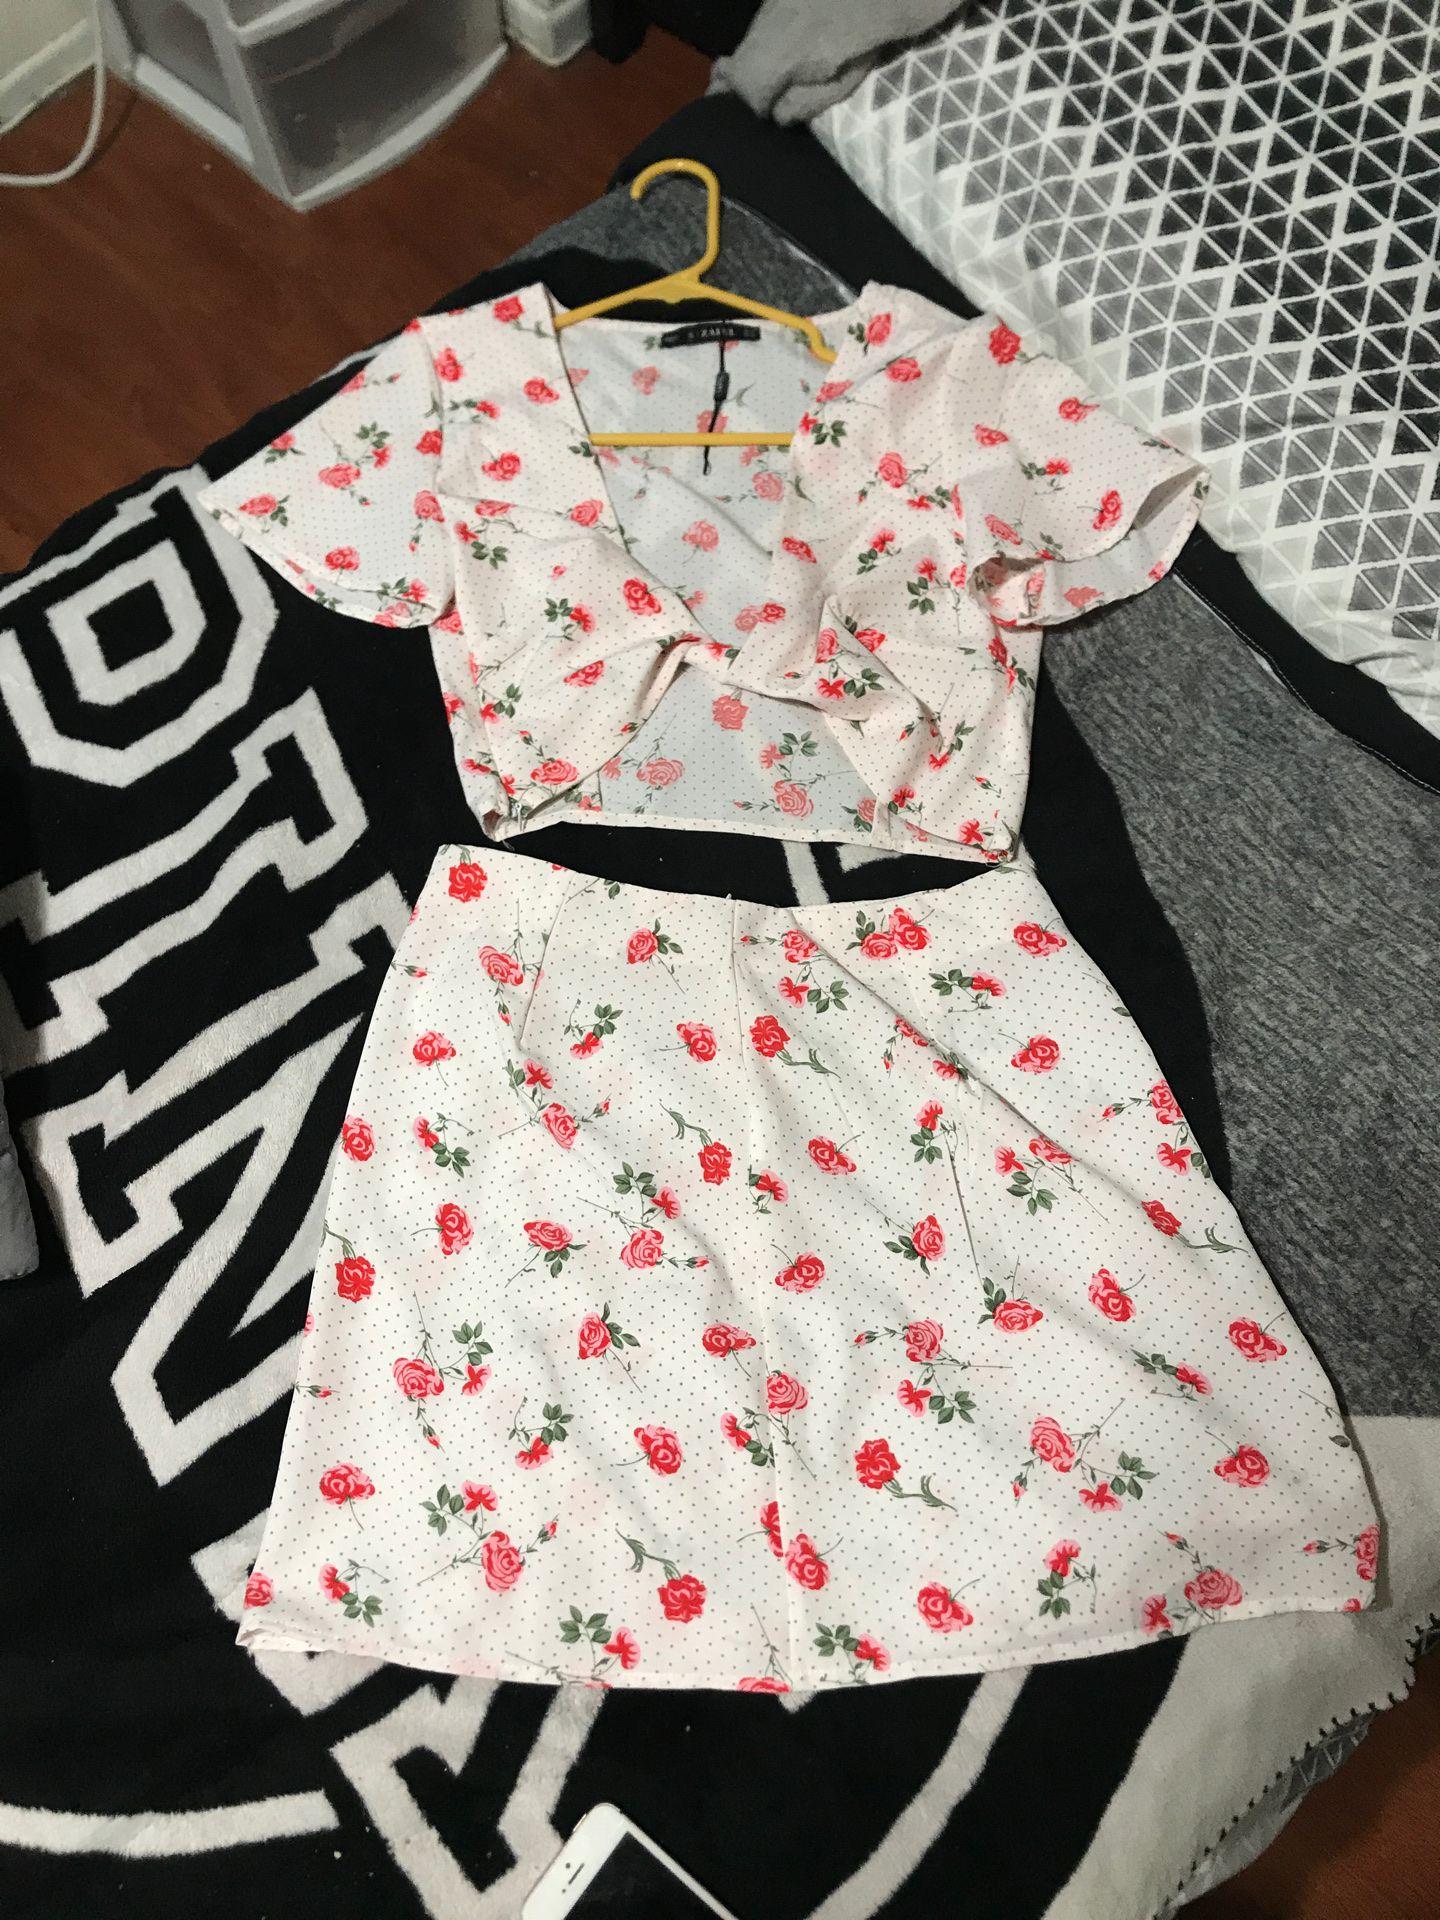 size small skirt set